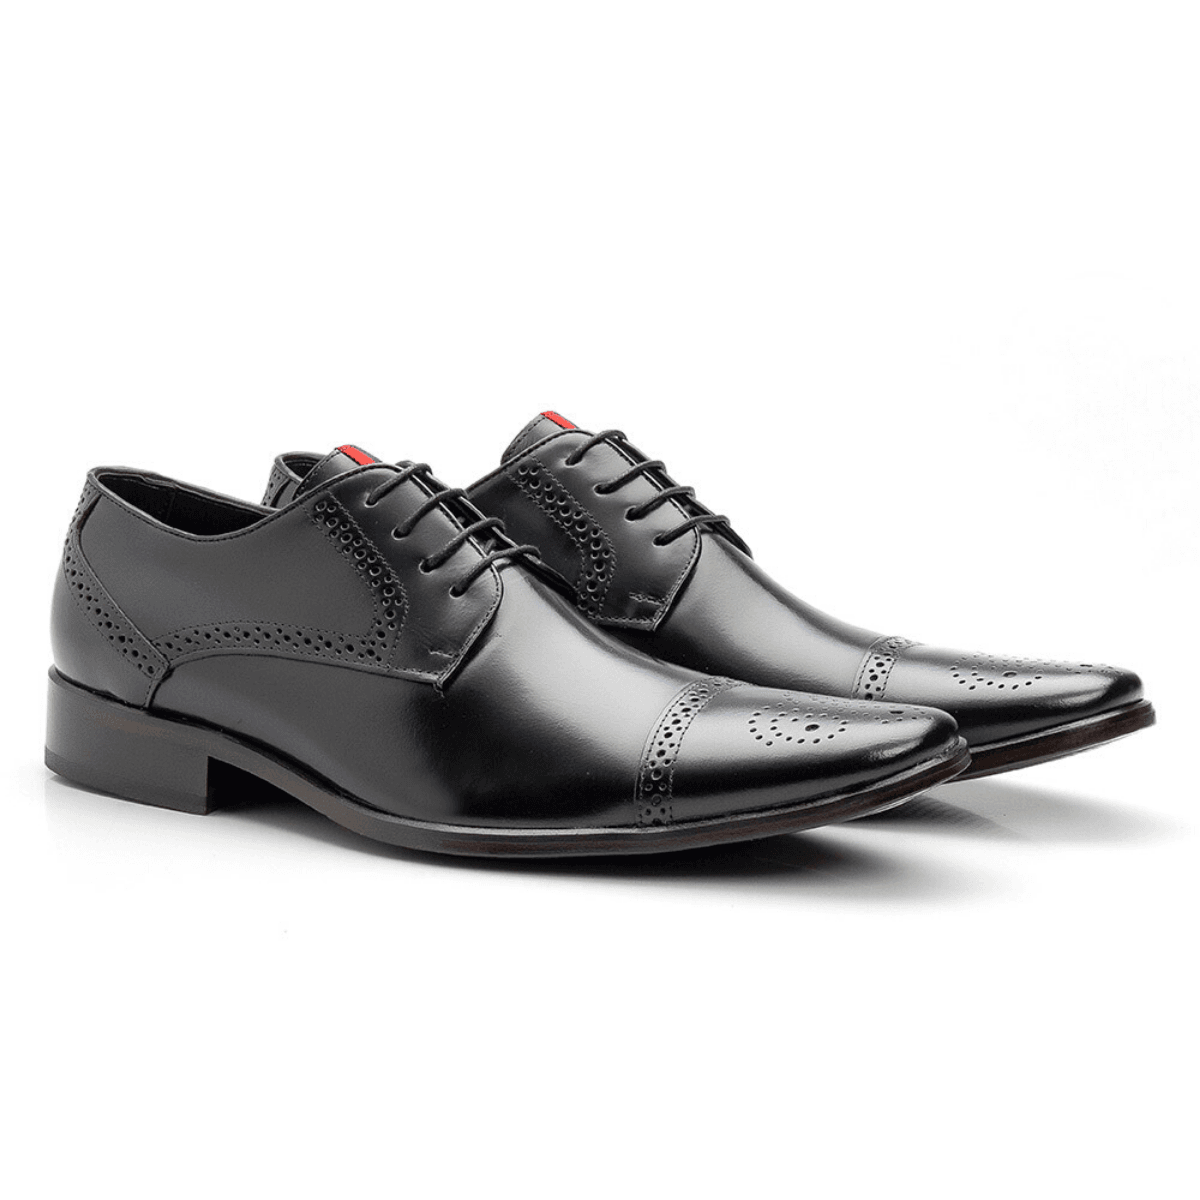 Sapato Social Masculino Brogue Couro Legítimo Preto